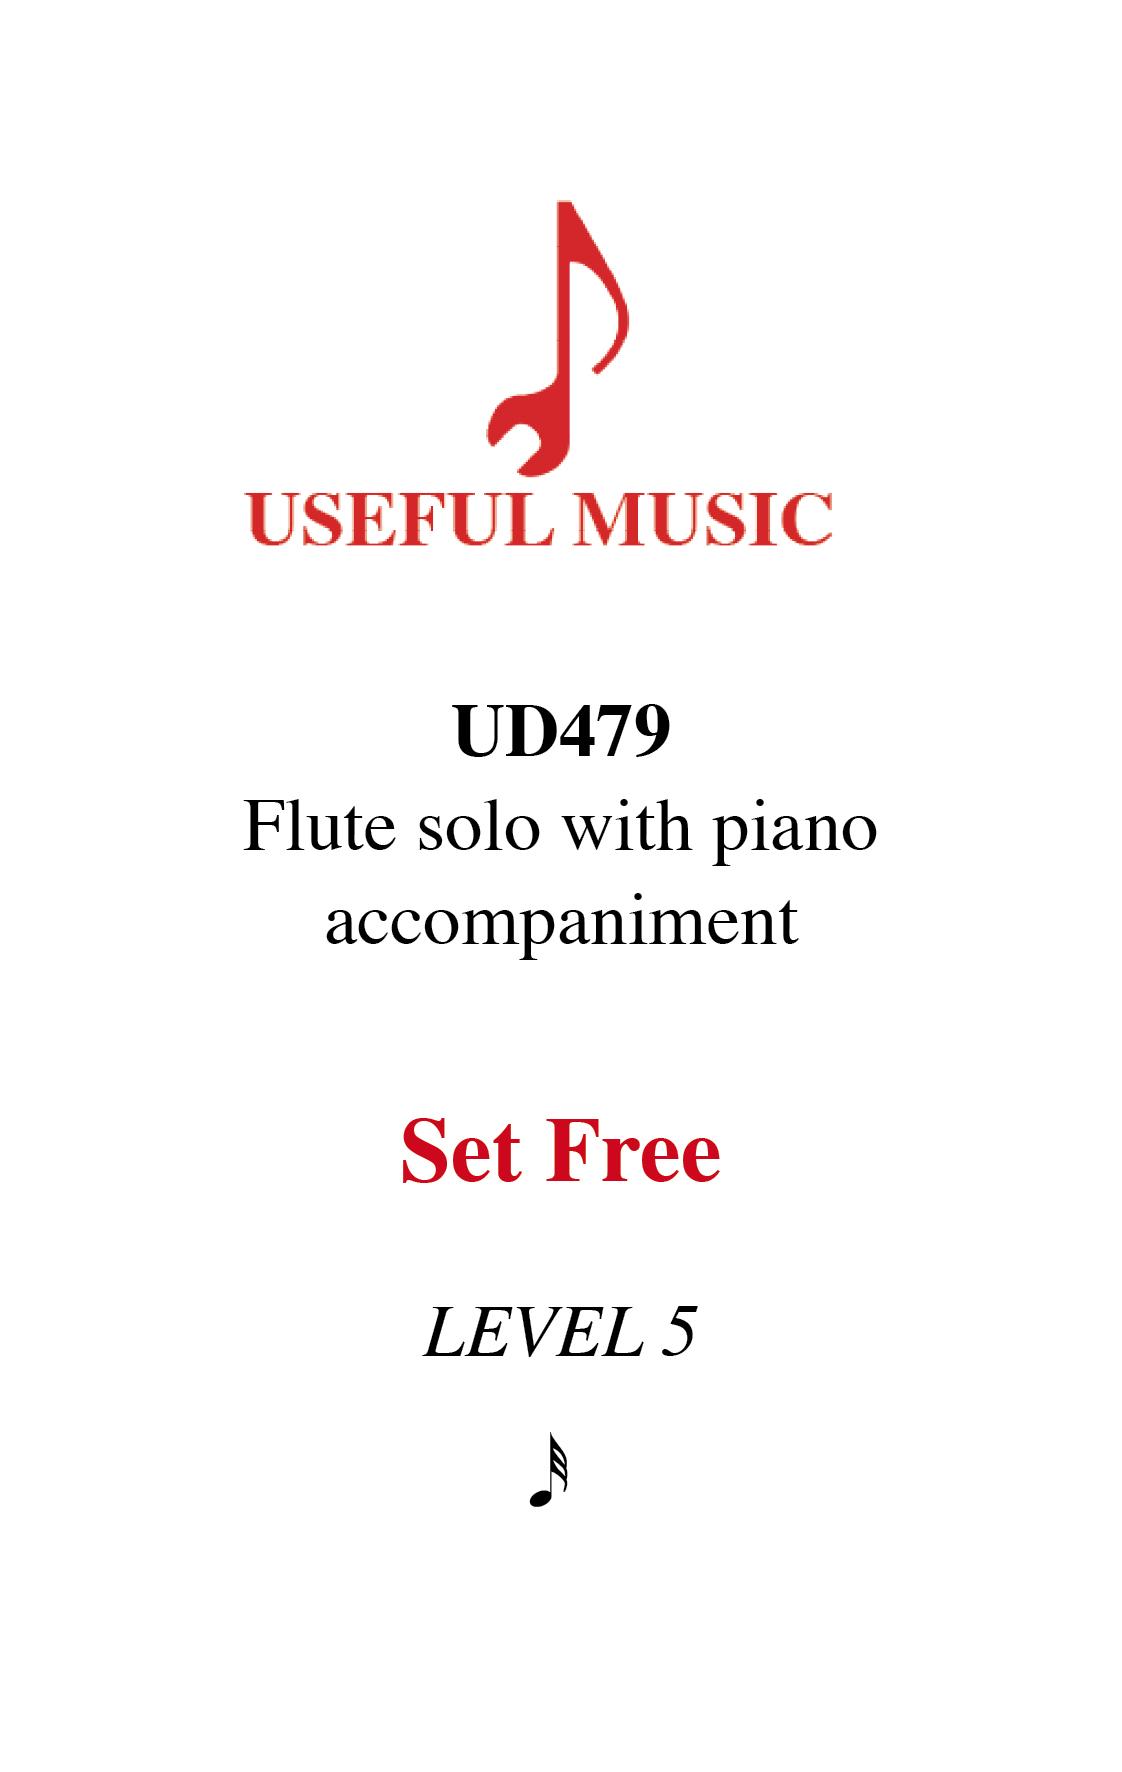 Set Free - flute with piano accompaniment